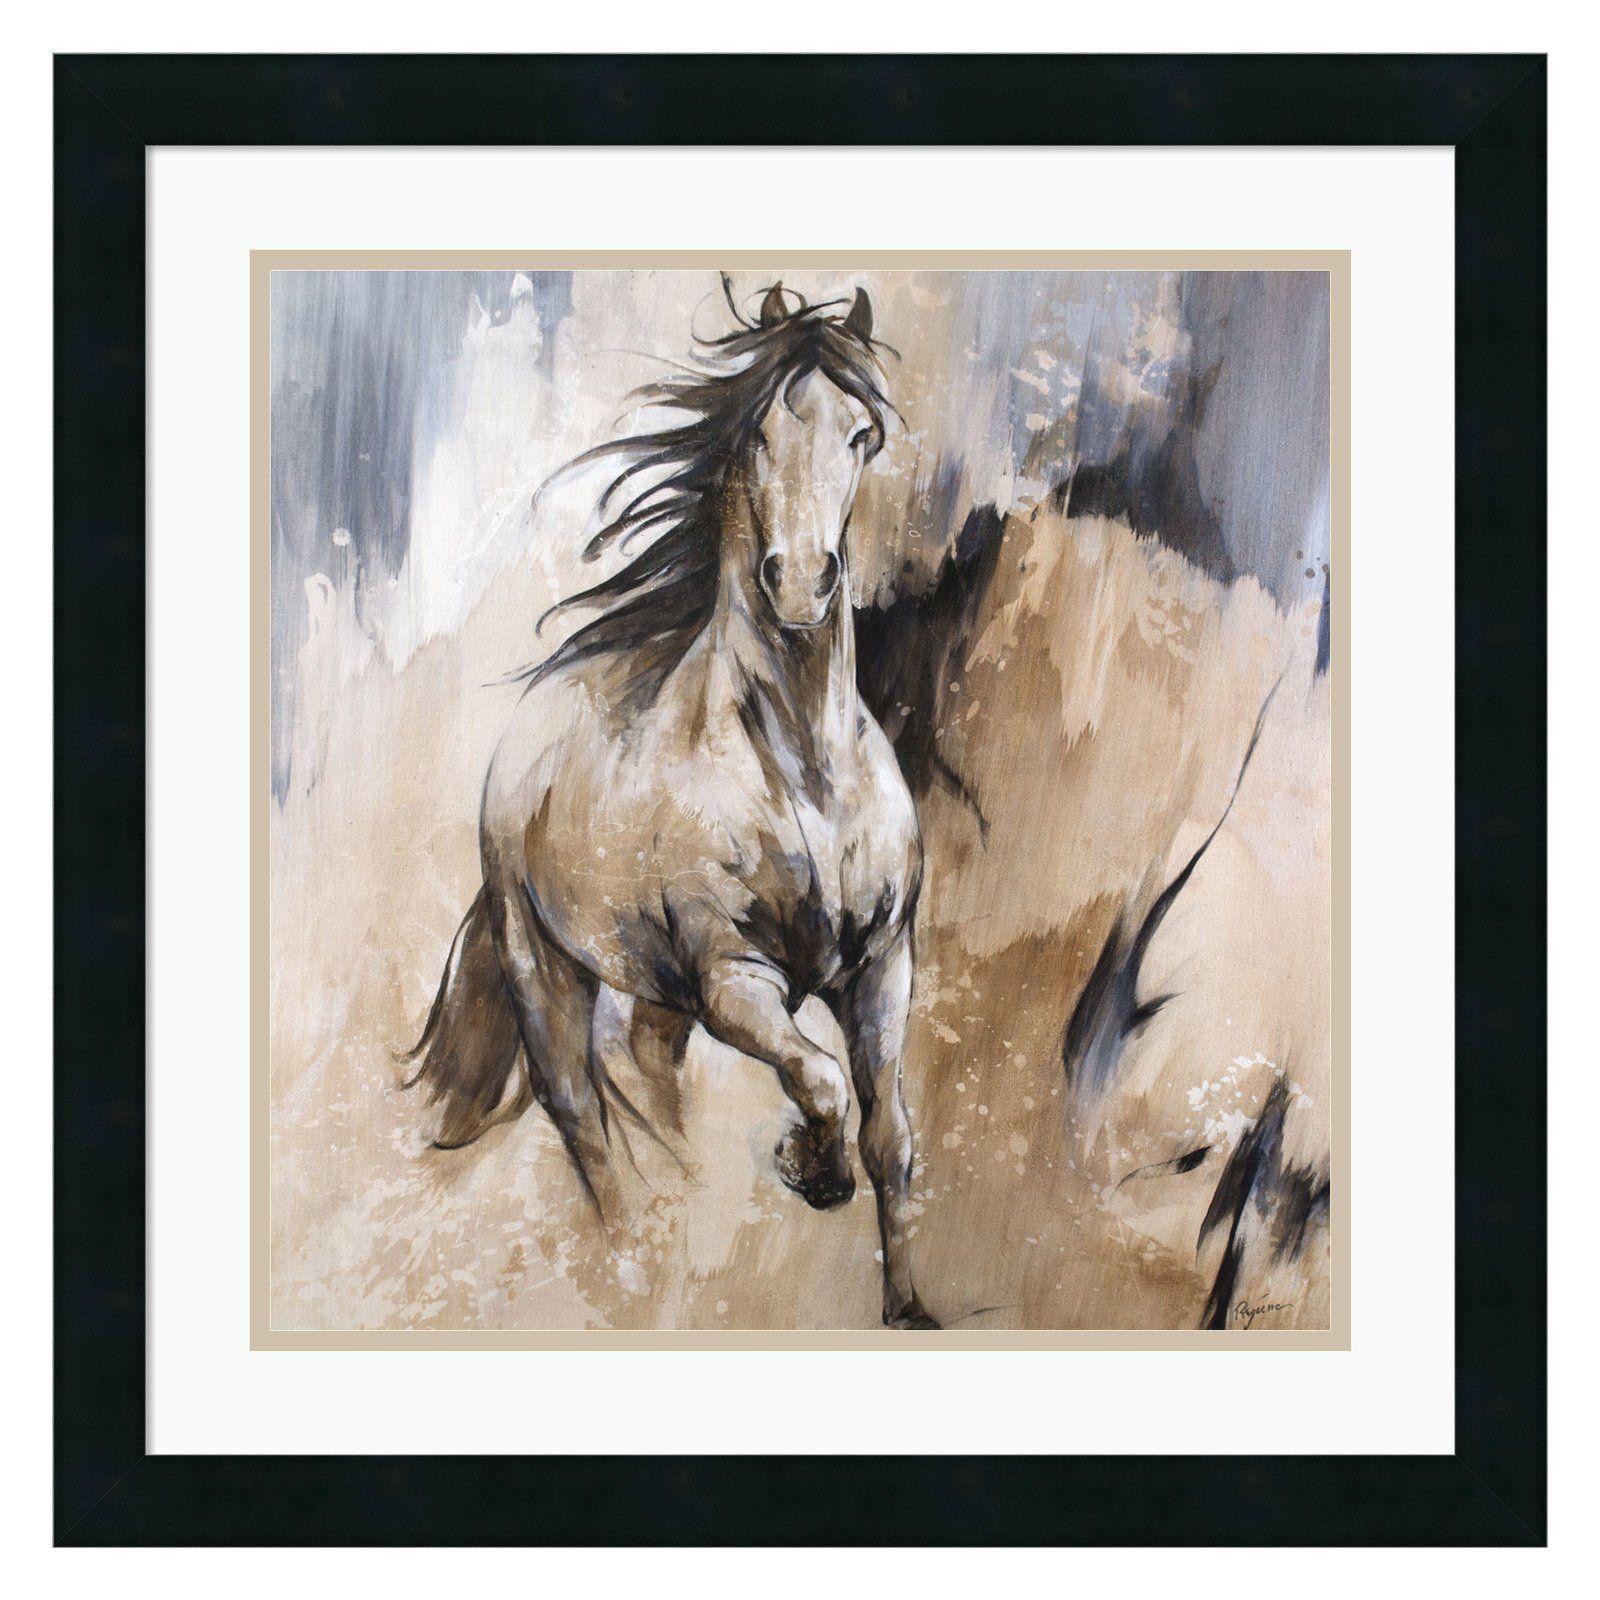 Amanti Art Framed Print Frison Horse By Cyril Reguerre Framed Art Prints Framed Art Amanti Art